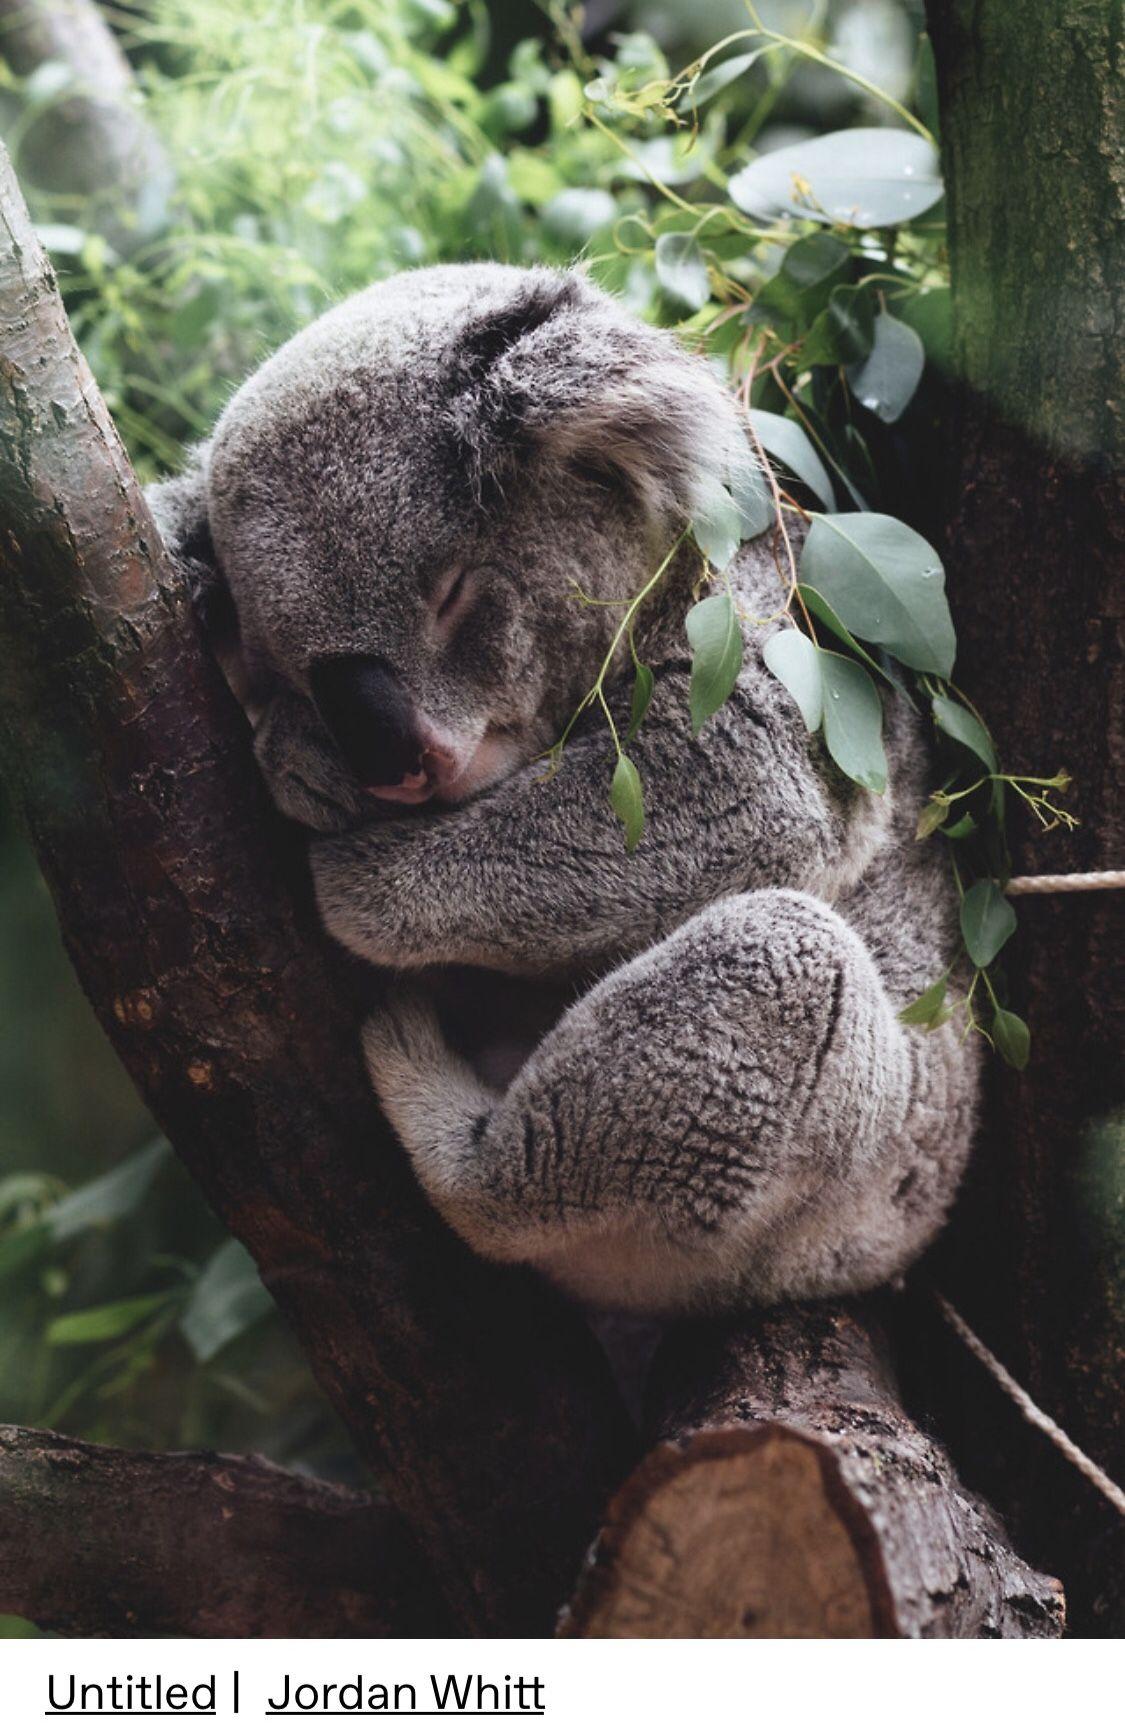 Pin By Khadidja Aiss On Animales Koala Bear Koala Koalas